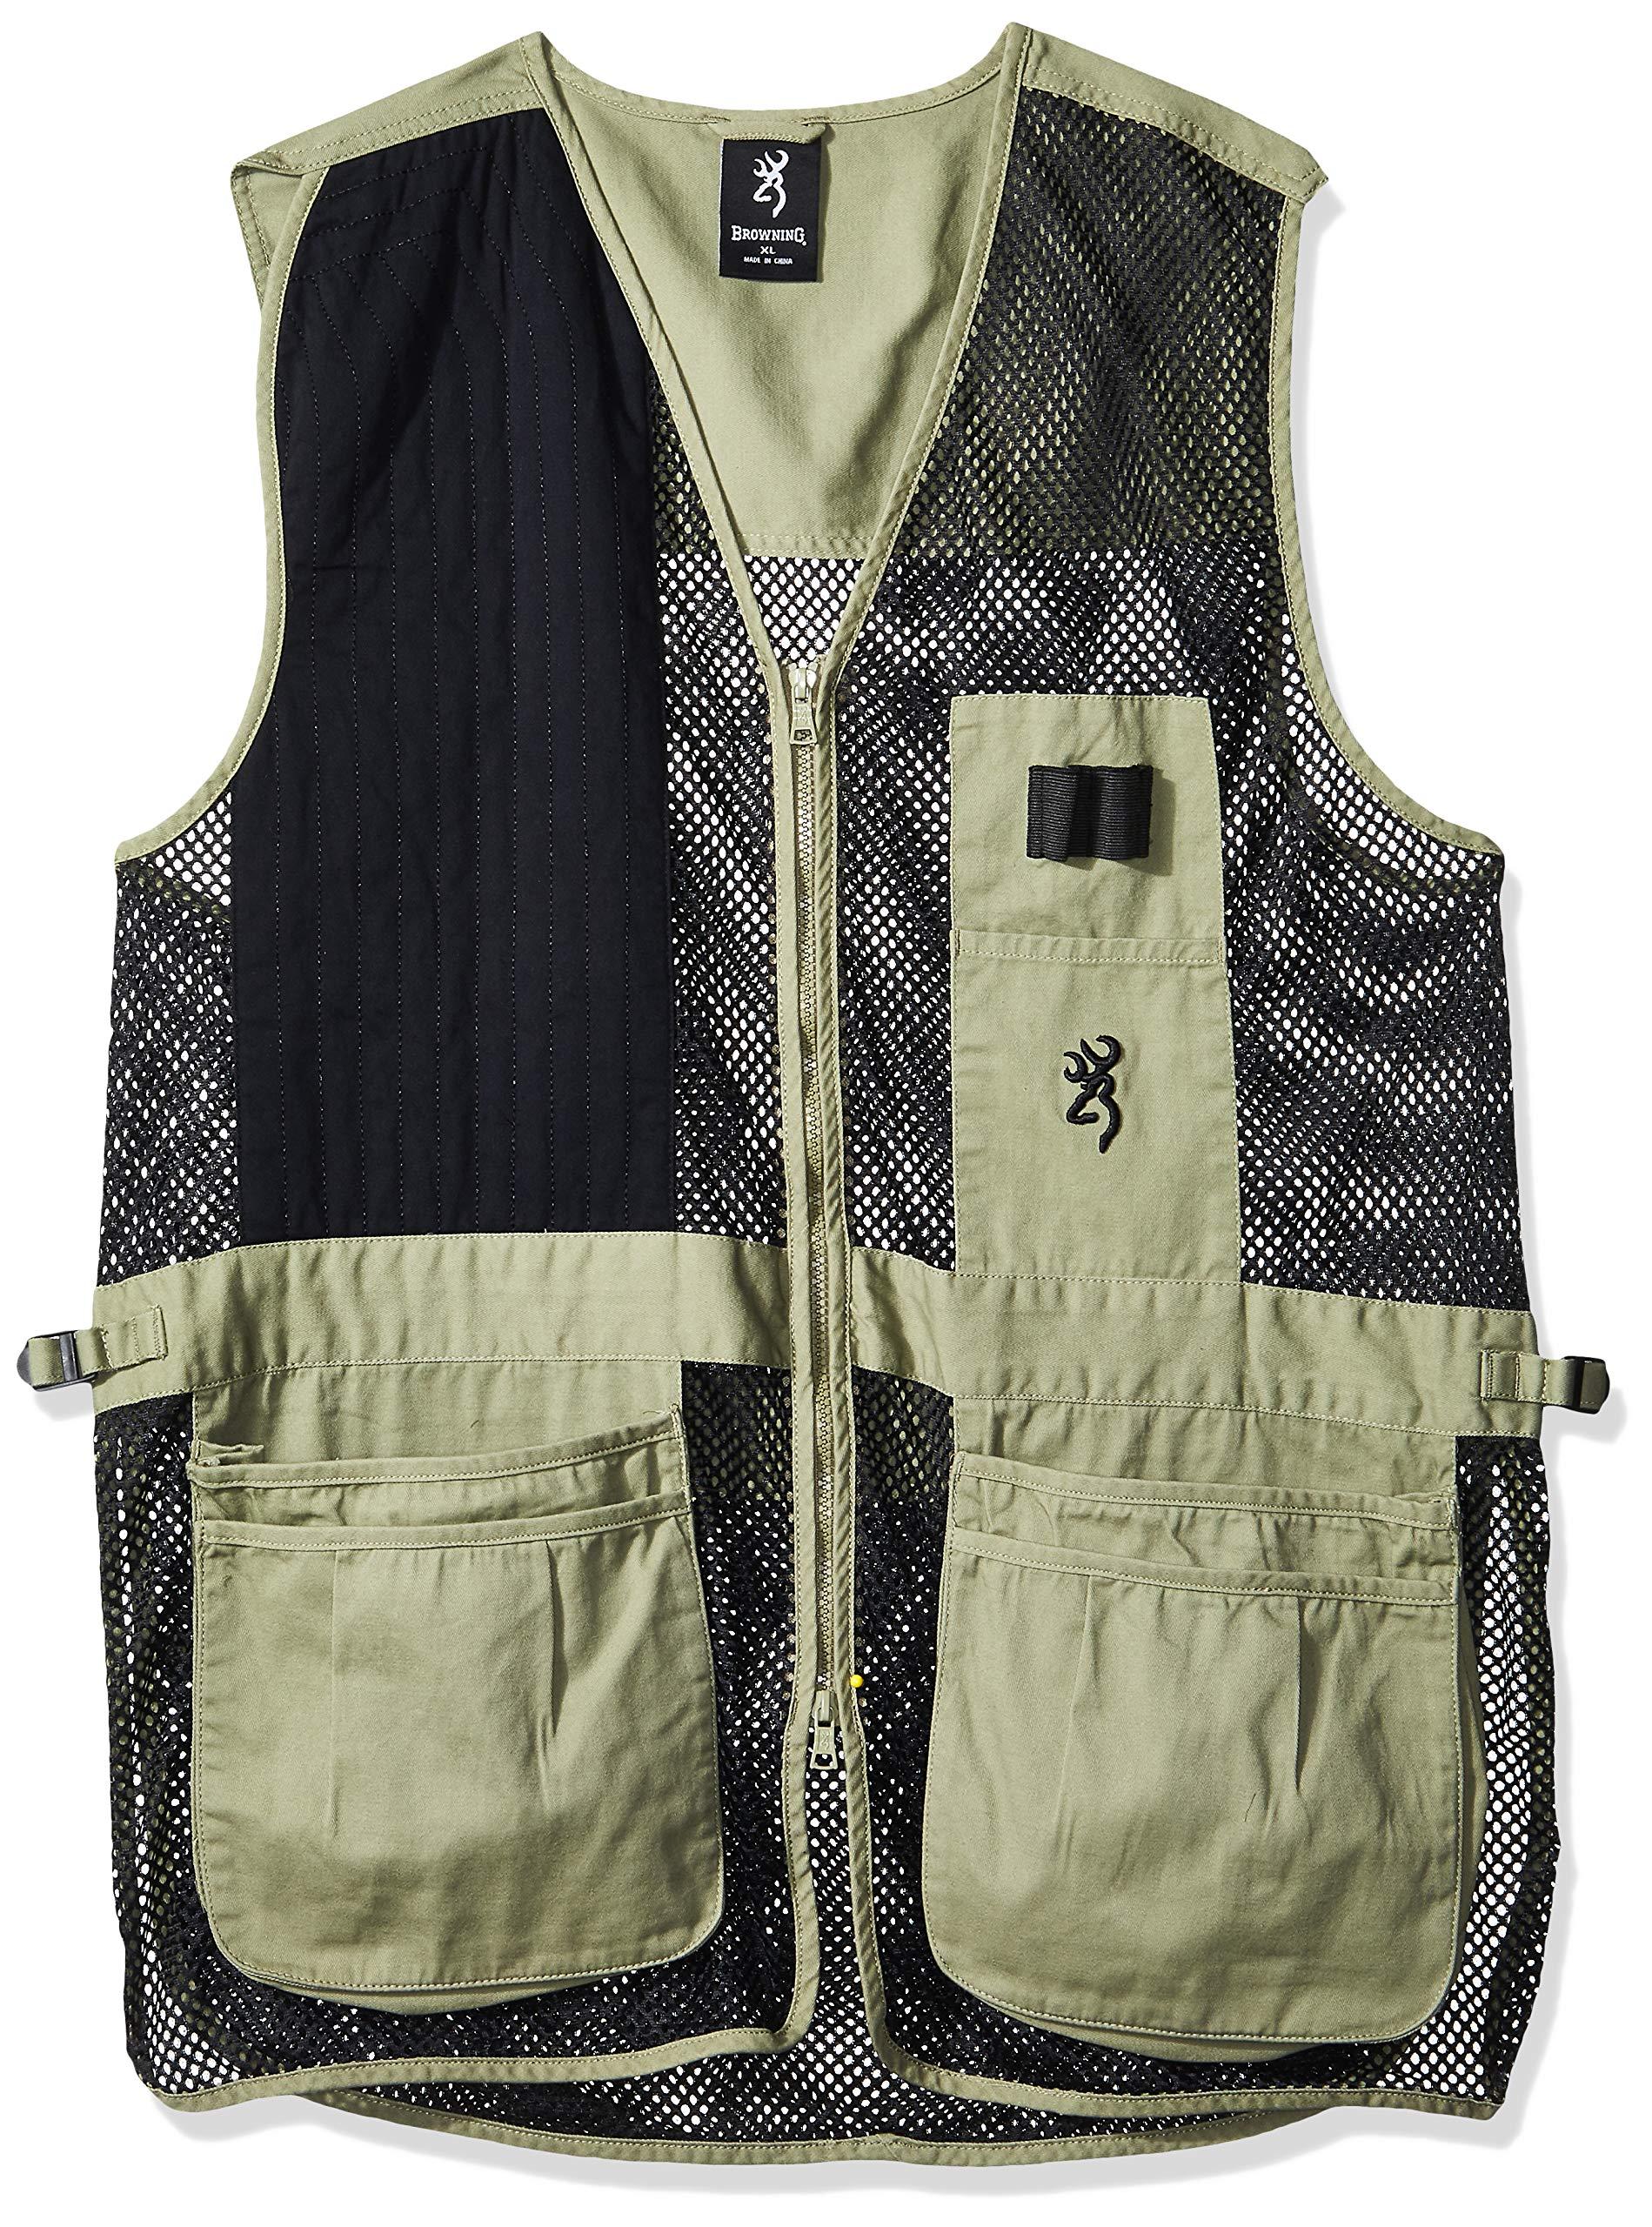 Browning, Trapper Creek Vest, Small, Sage/Black